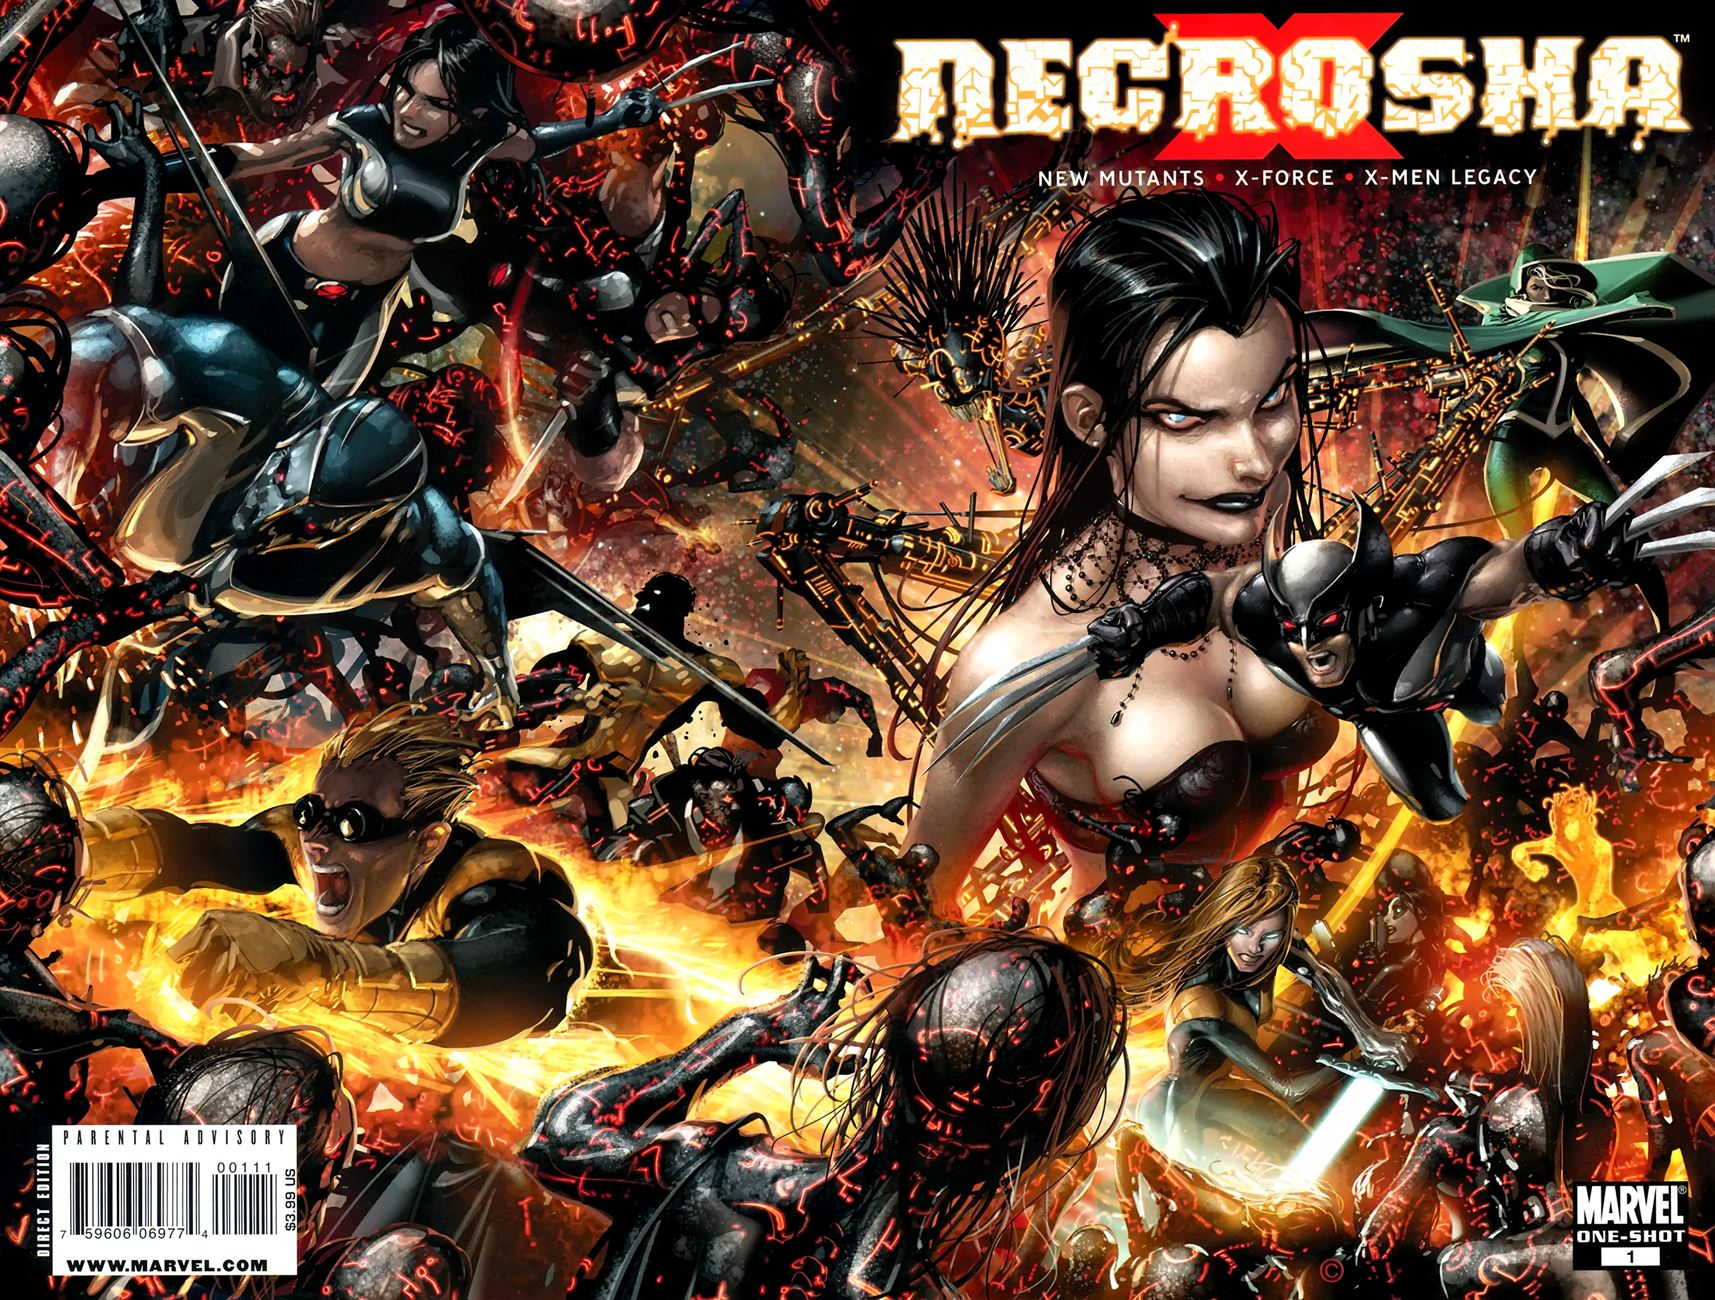 X-Men Necrosha chap 1 trang 1